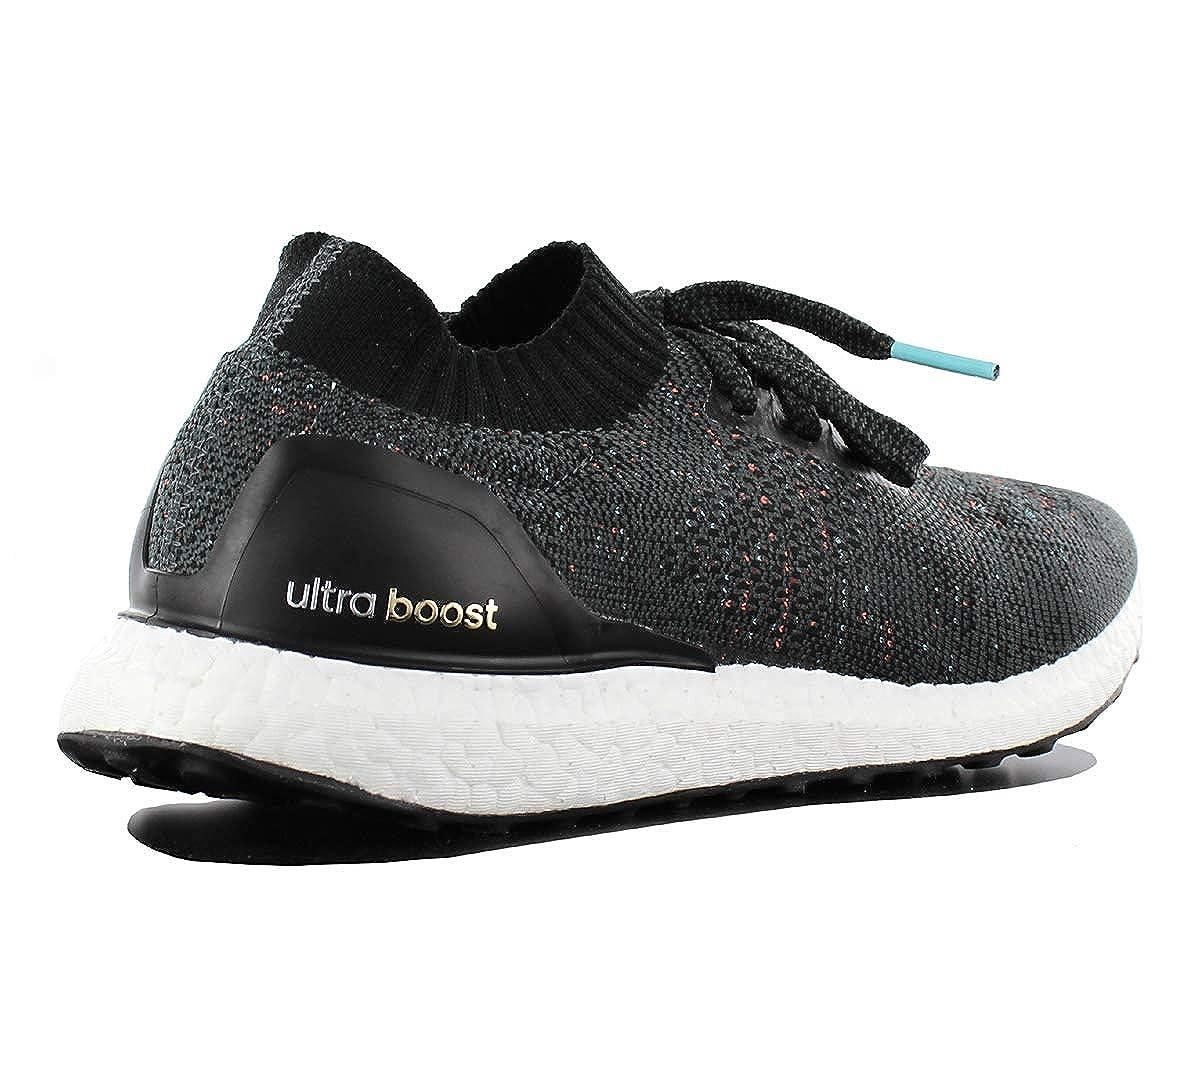 Adidas Unisex-Erwachsene Ultra Ultra Ultra Boost 486 Turnschuhe Solid grau, Core schwarz c1d8ad